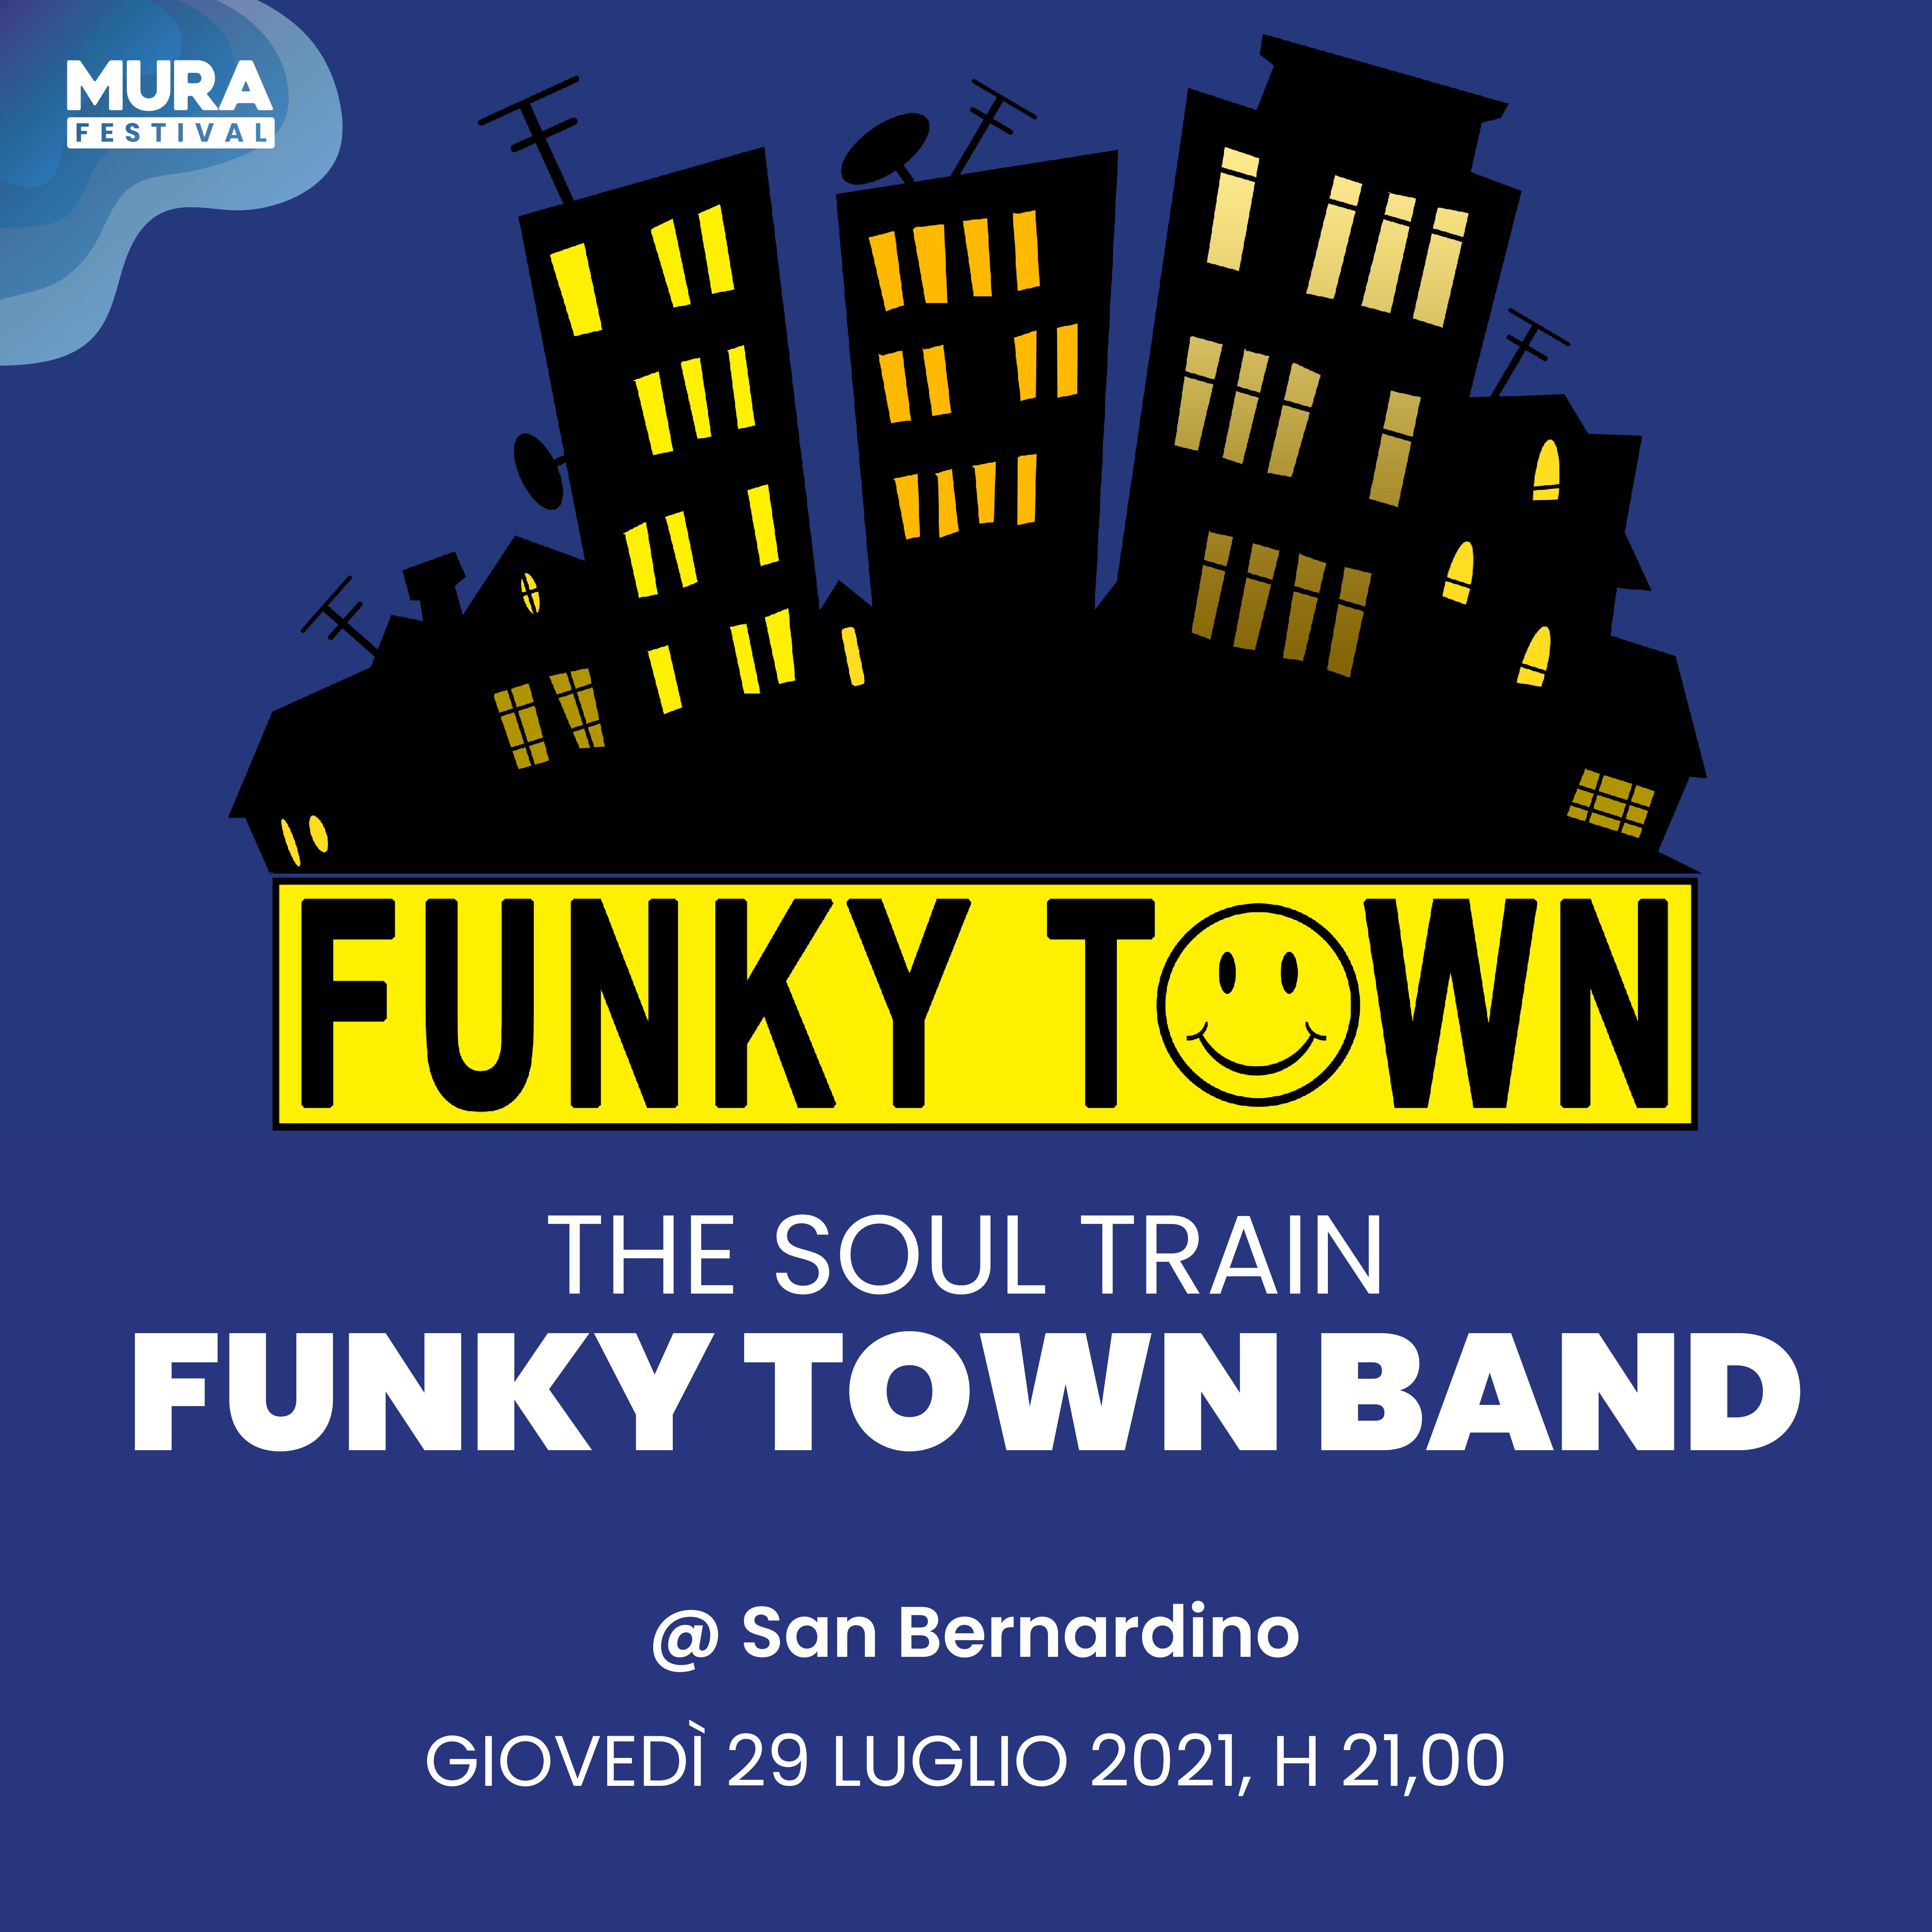 Funky Mura Night - Funky town